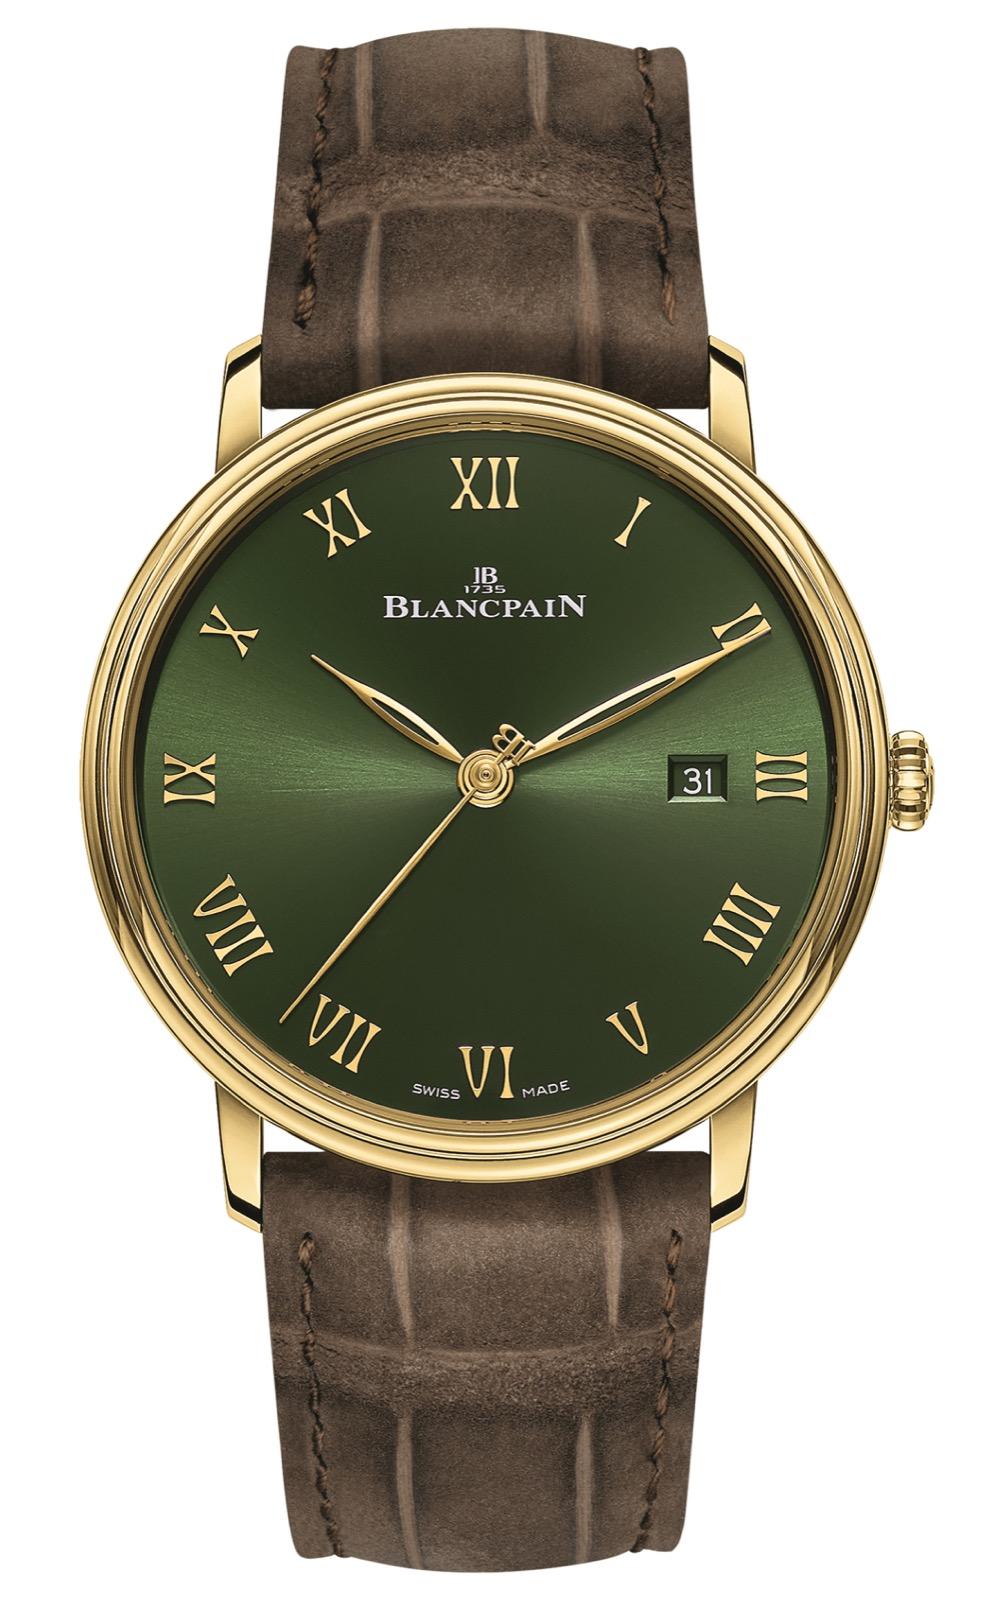 Blancpain Villeret Extraplate edición Boutique